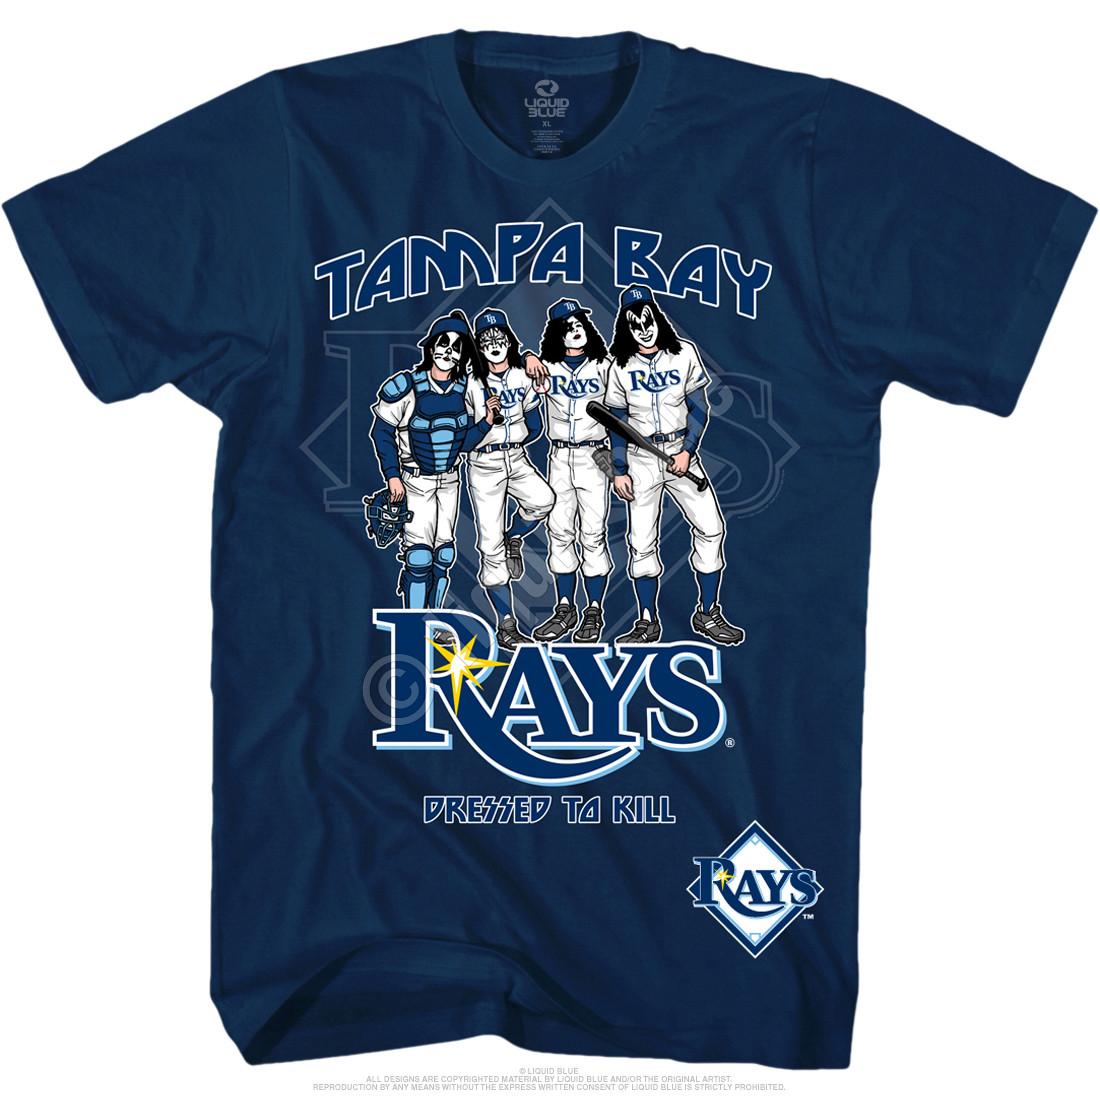 3167e35ec MLB Tampa Bay Rays KISS Dressed to Kill Navy T-Shirt Tee Liquid Blue